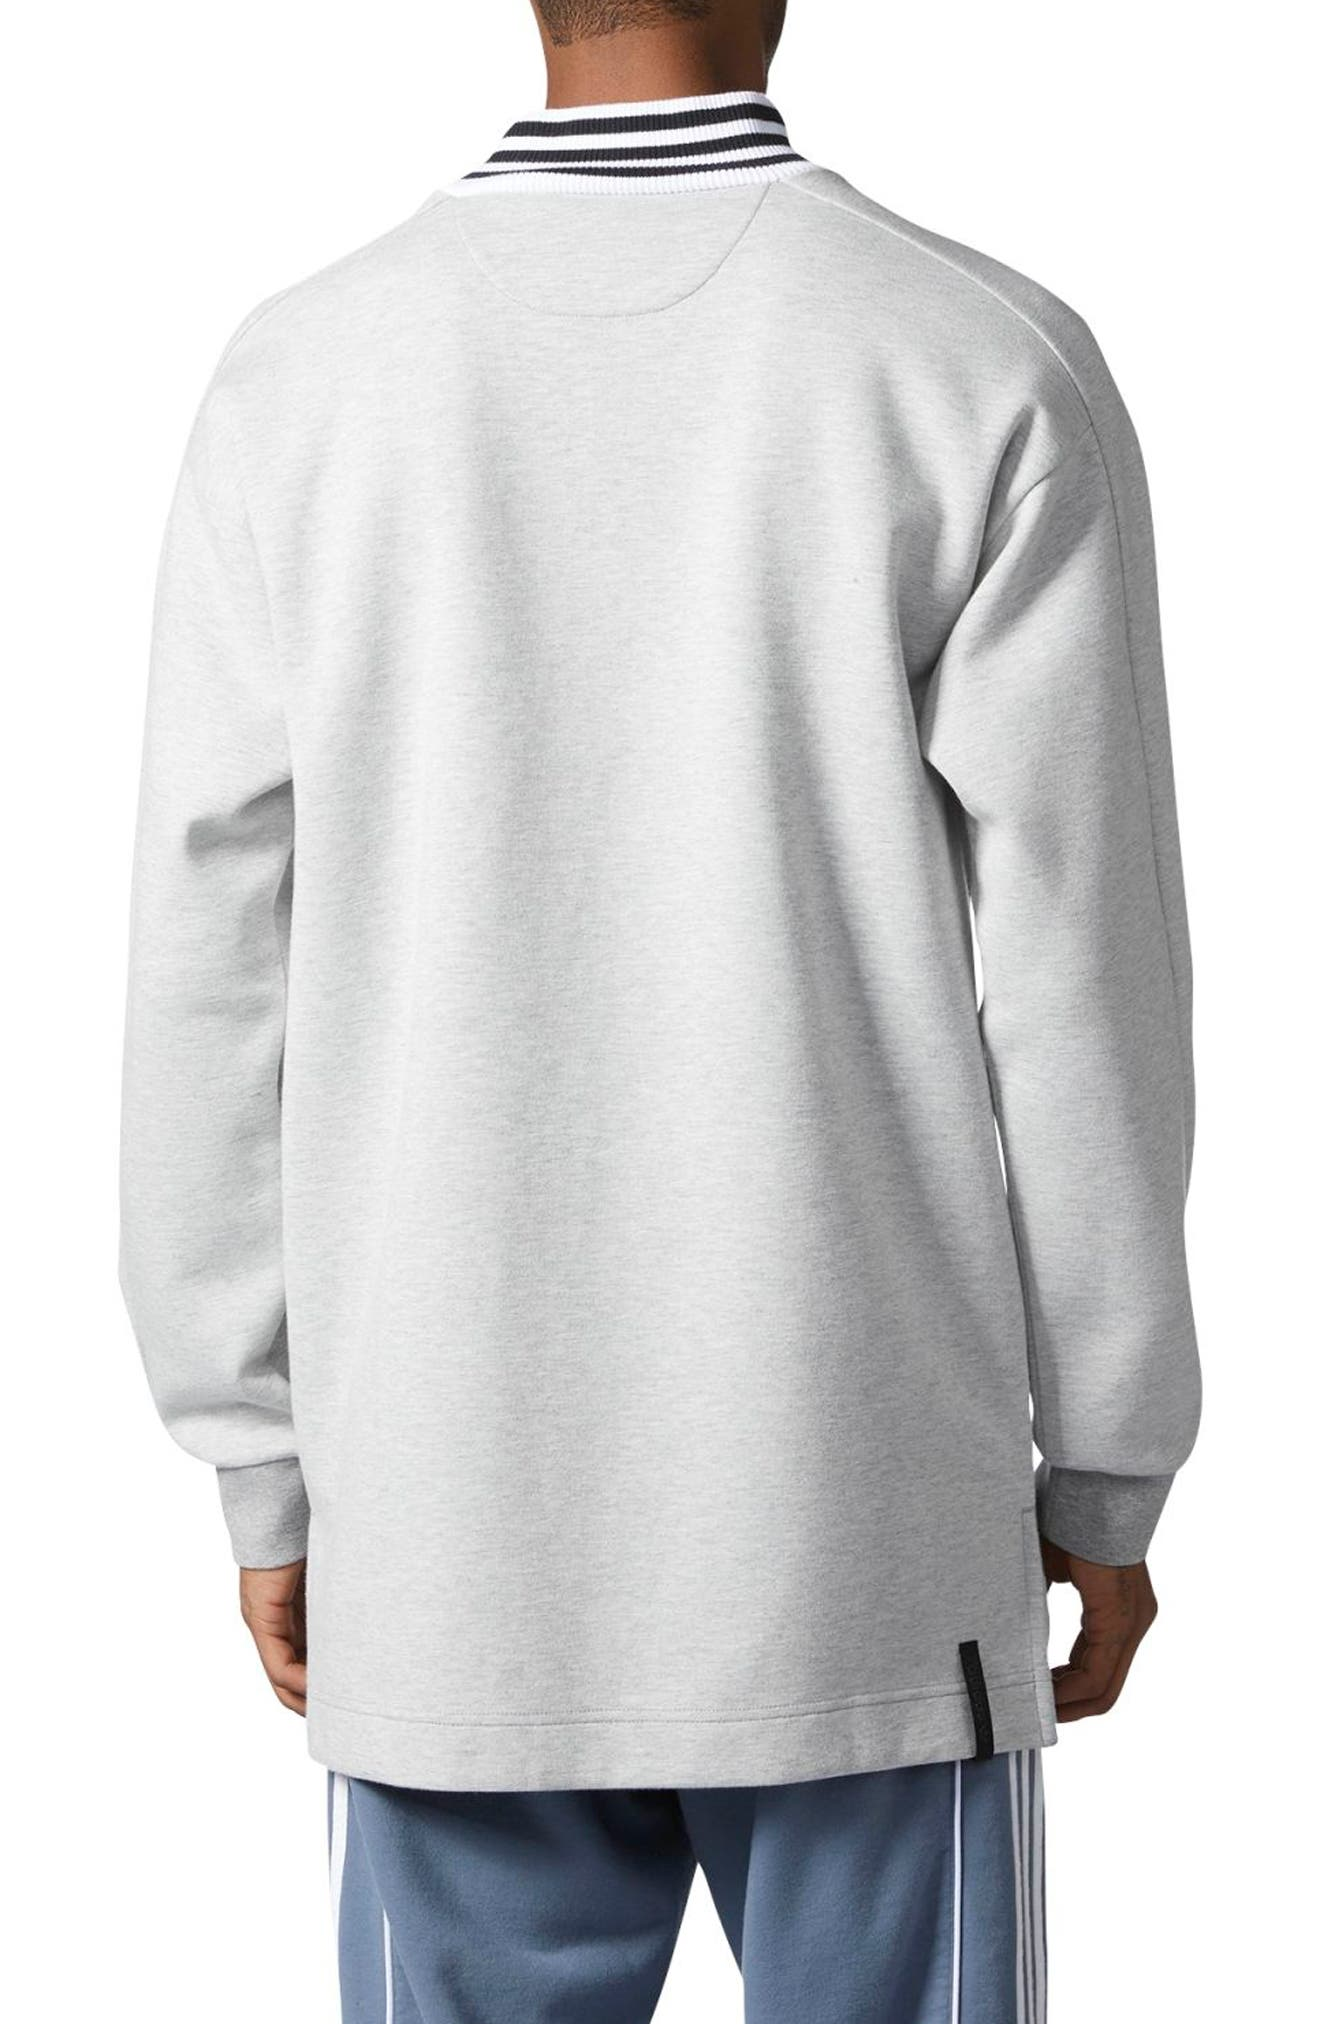 ADIDAS ORIGINALS,                             Mock Neck Sweatshirt,                             Alternate thumbnail 2, color,                             035